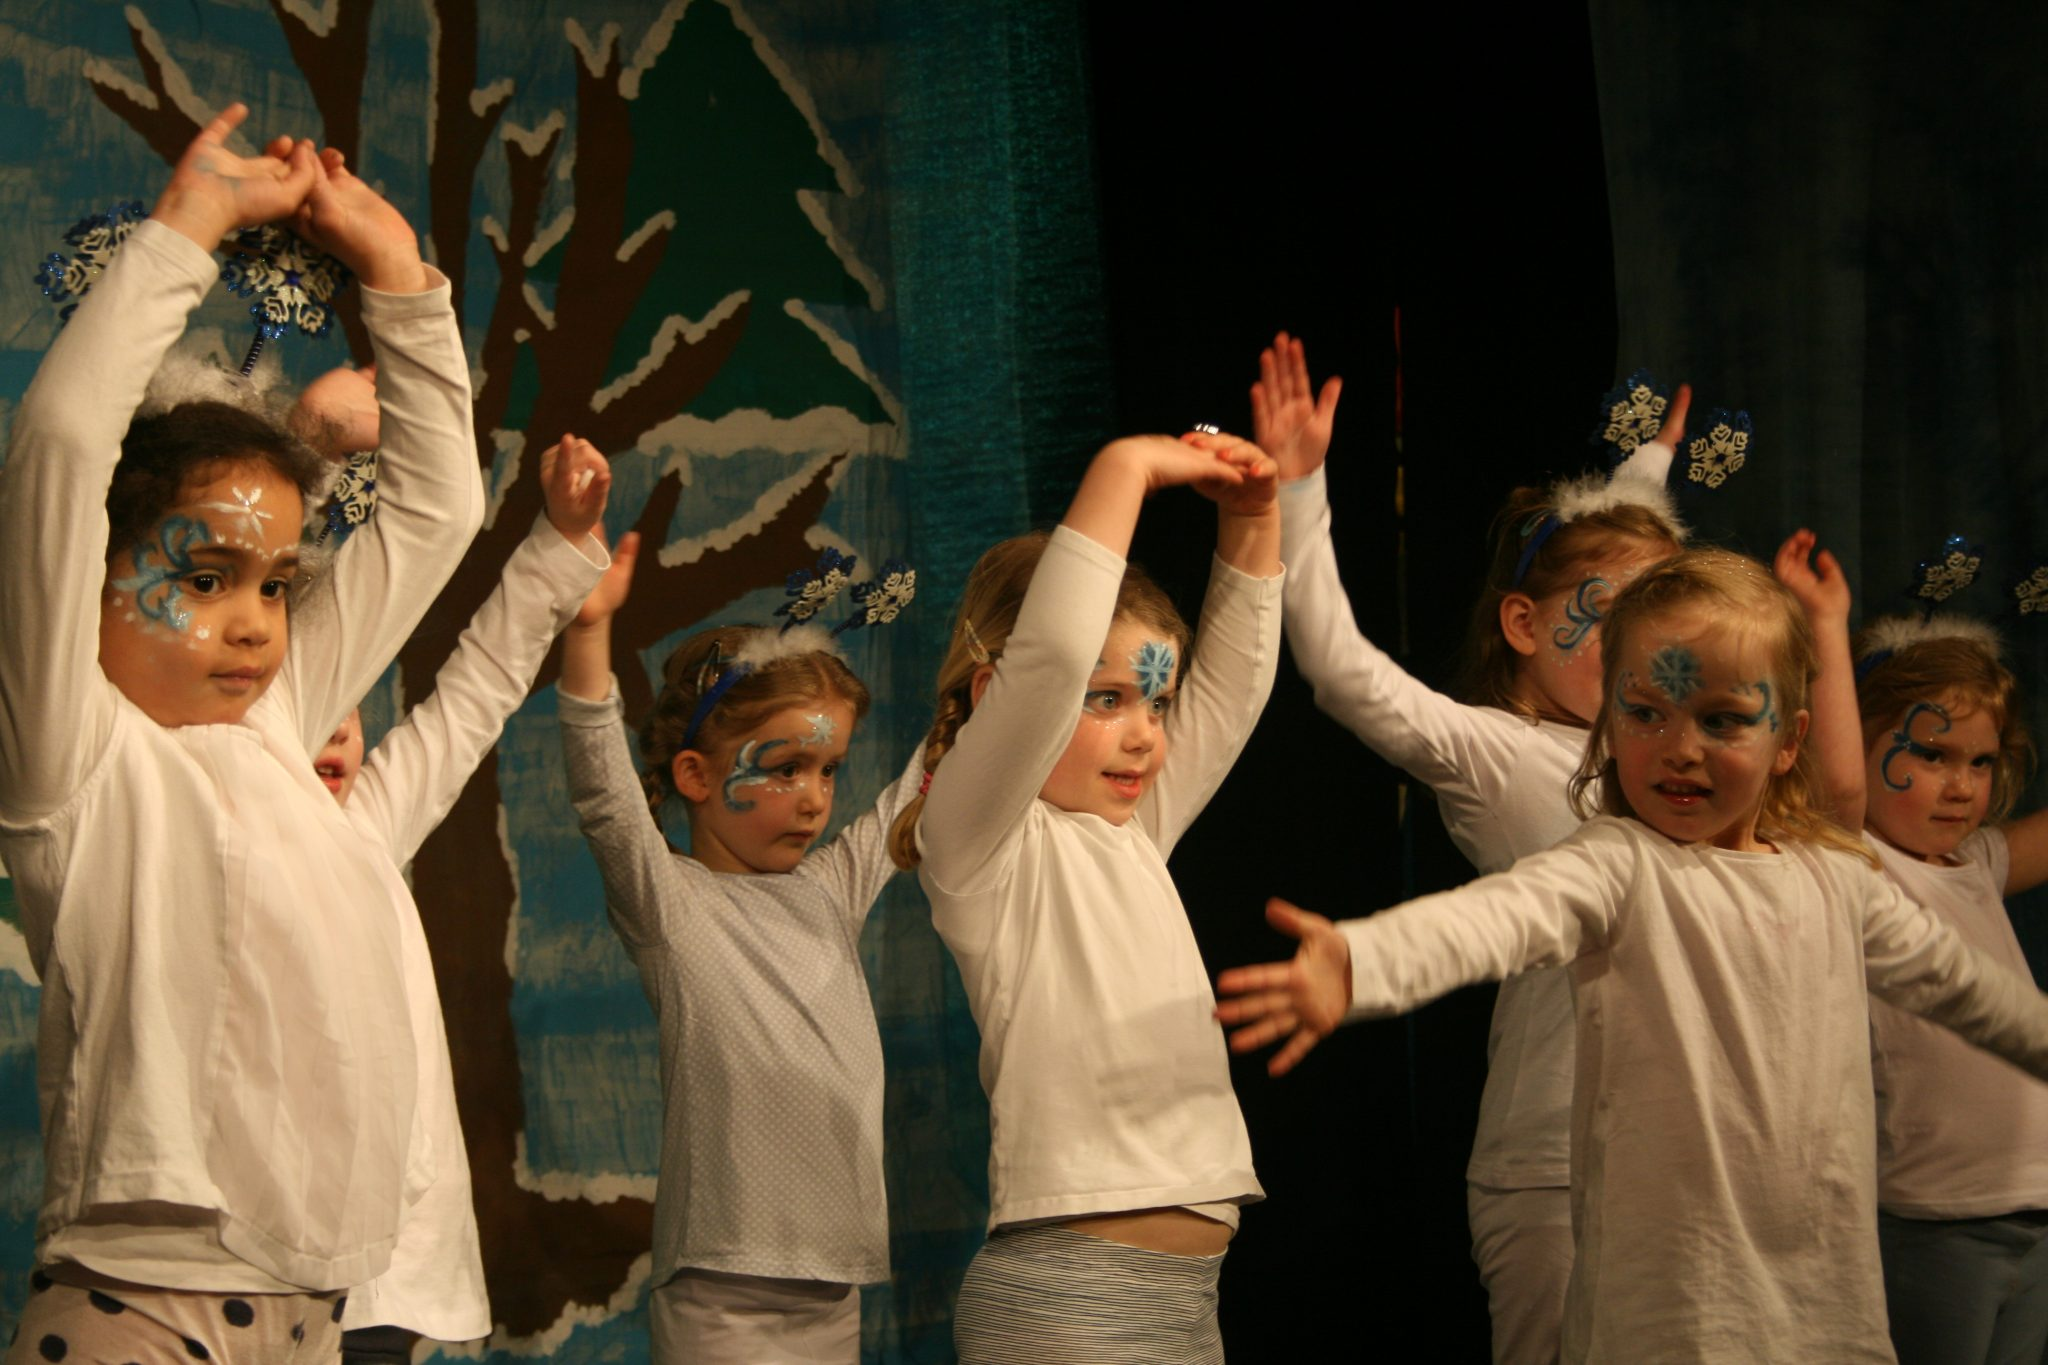 ZOMERTOER: Theater in drie makkelijke stappen